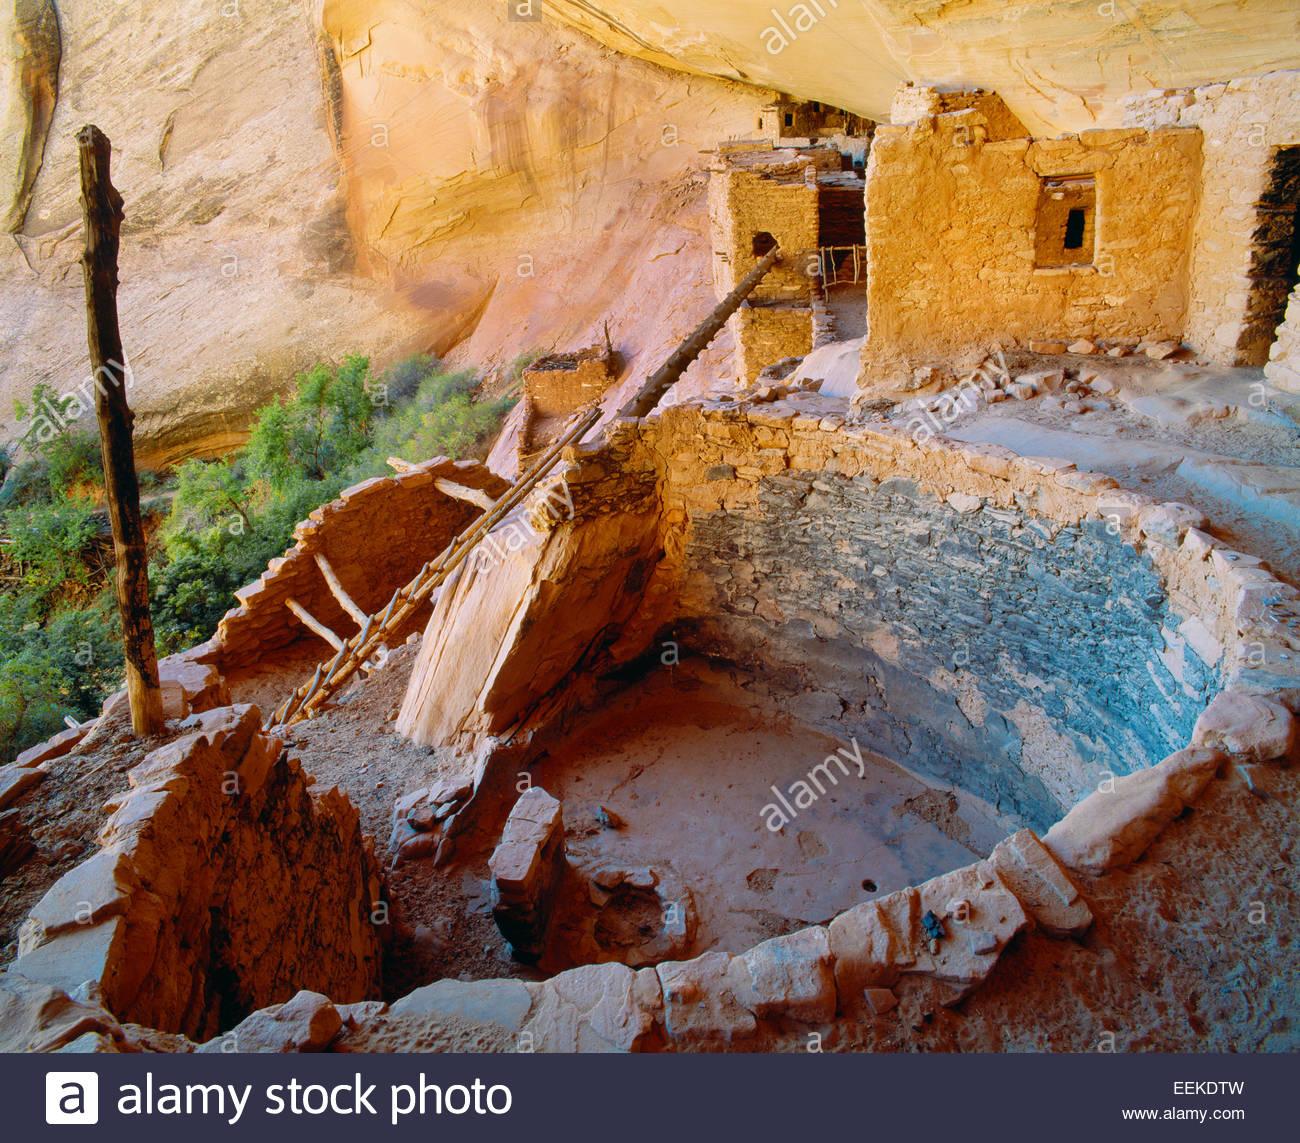 Ancient Anasazi kiva [ceremonial chamber] Navajo National Monument, Arizona. - Stock Image